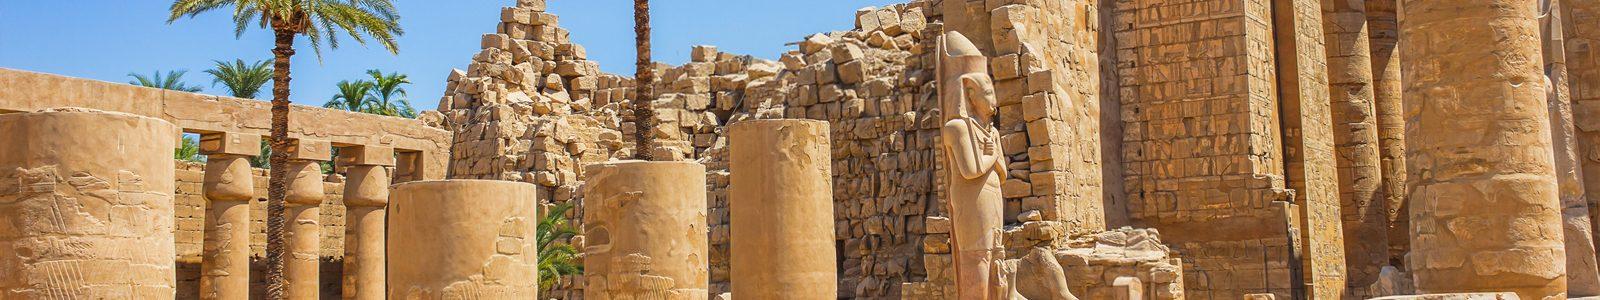 Egypt Itinerary 11 Days